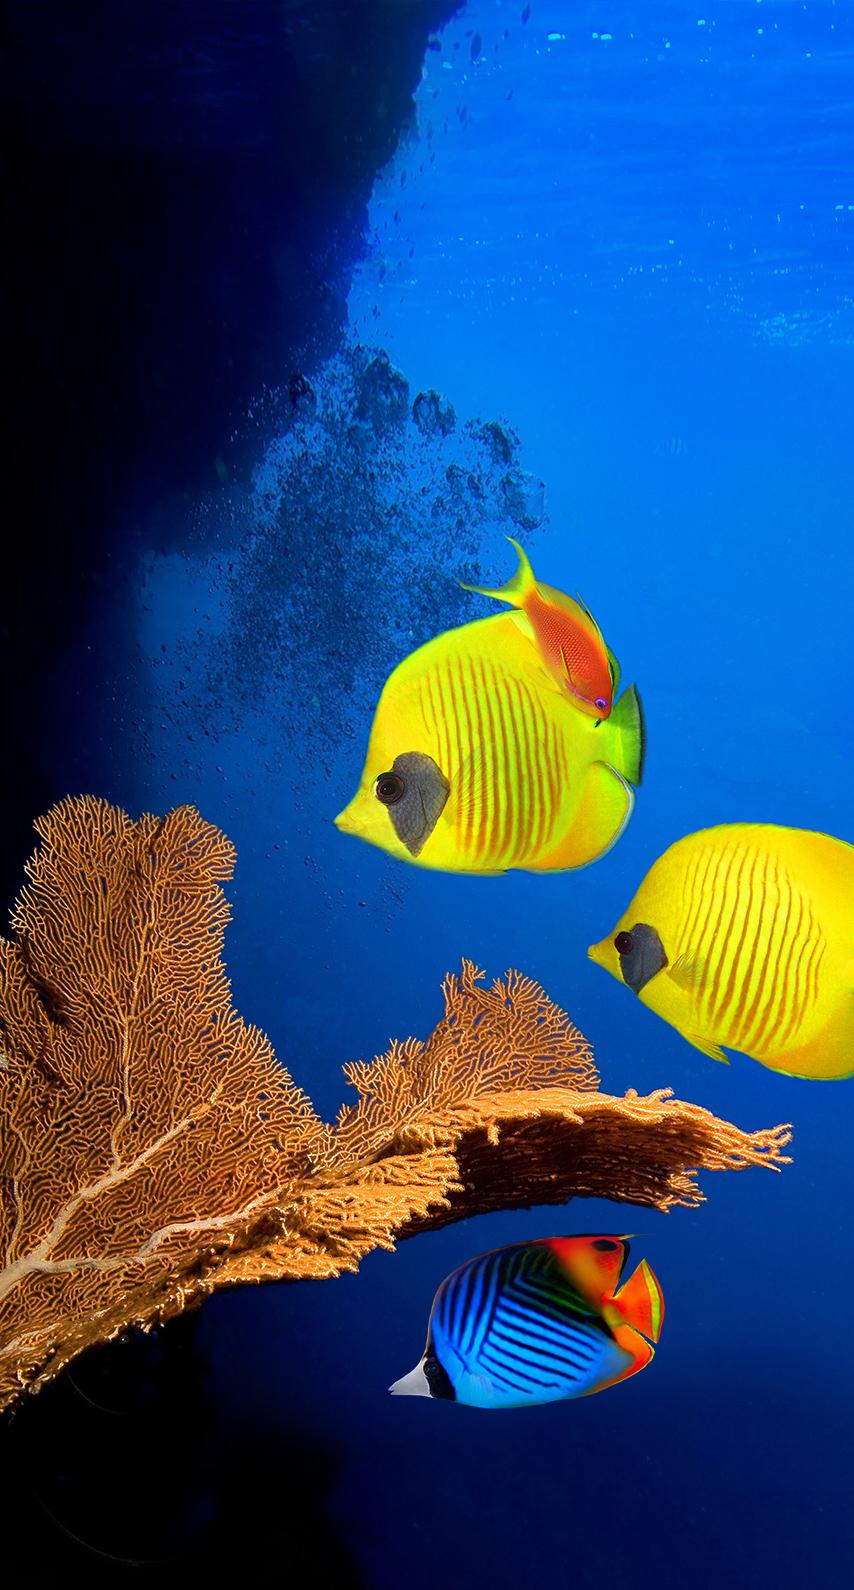 fish, tropical